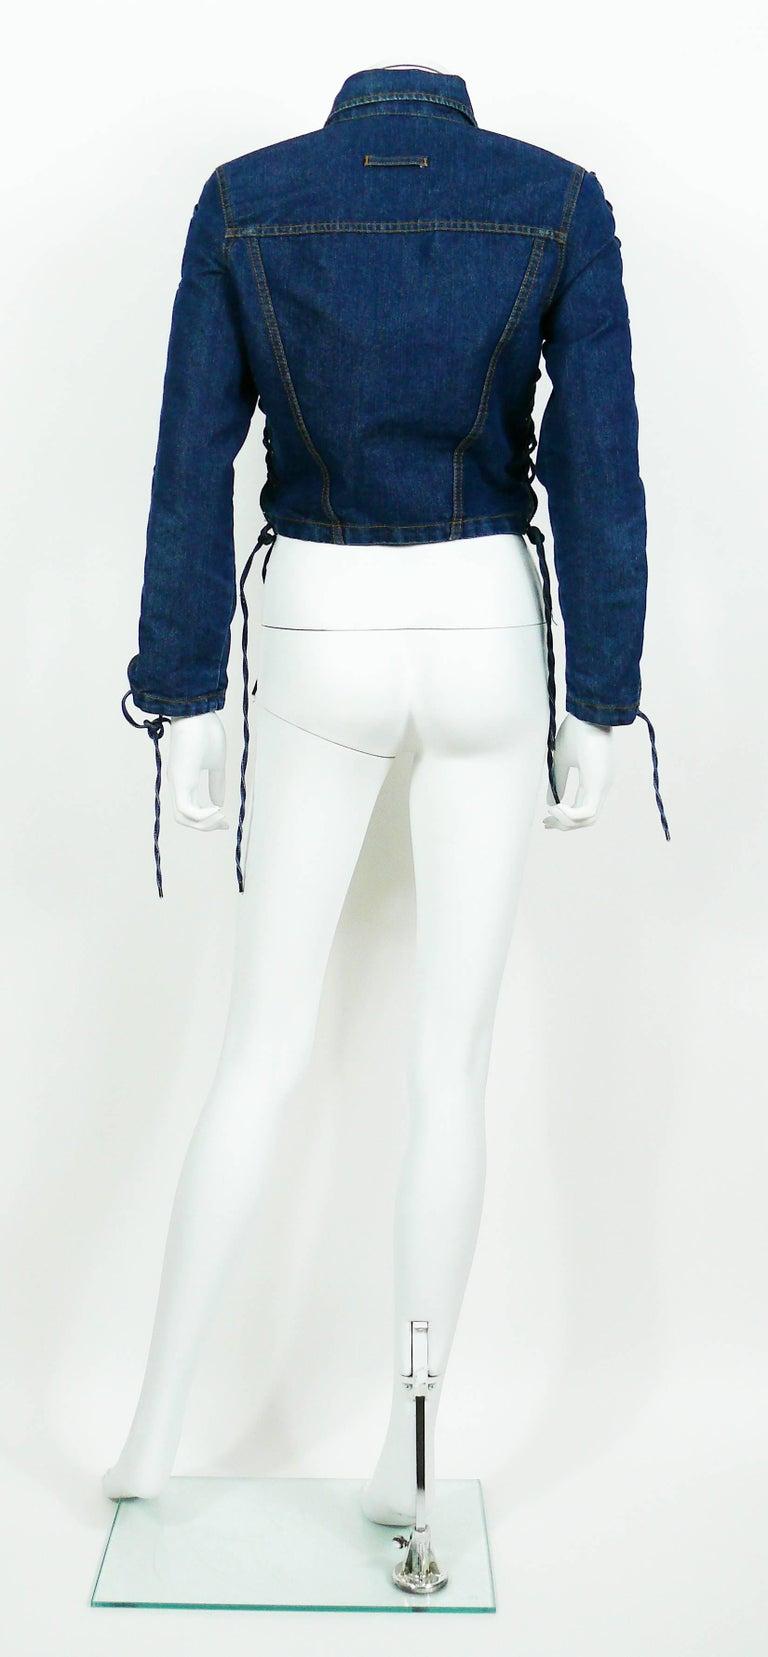 Jean Paul Gaultier Vintage Laced Denim Cropped Jacket For Sale 2